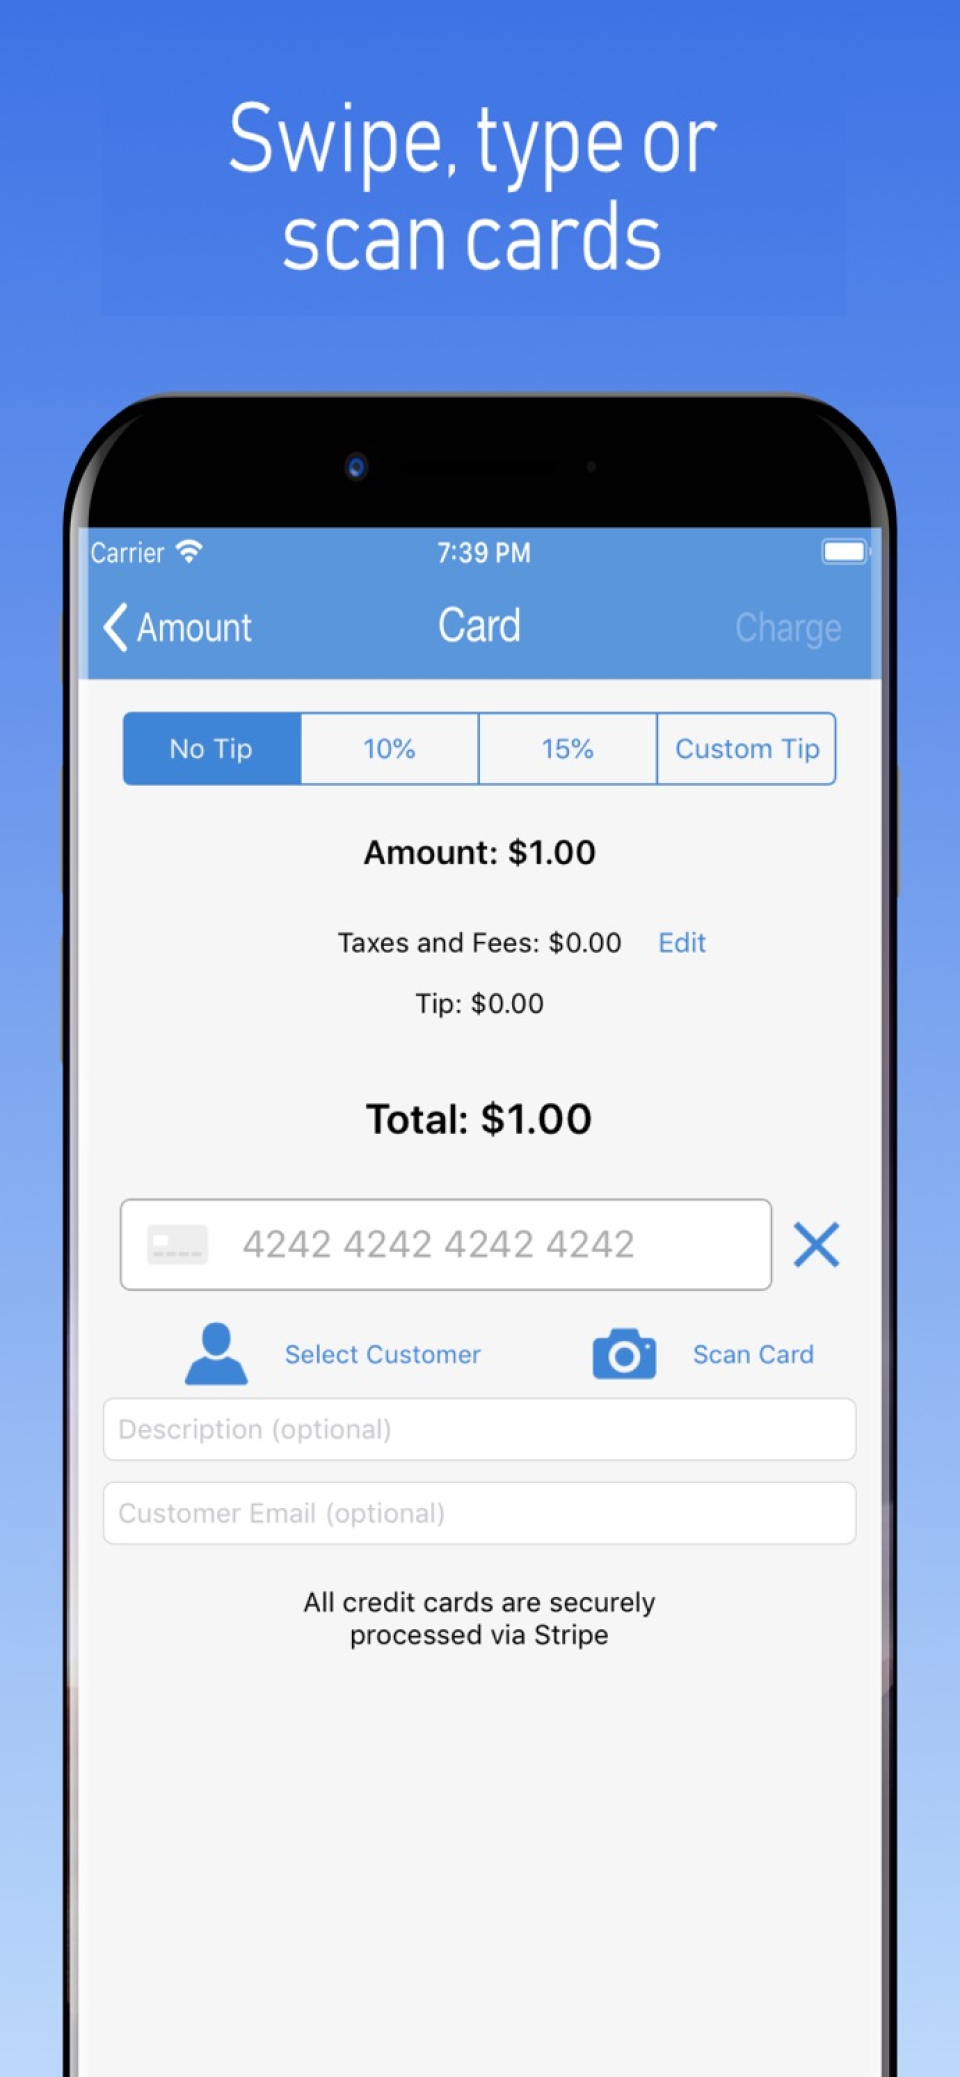 Type, swipe or scan cards